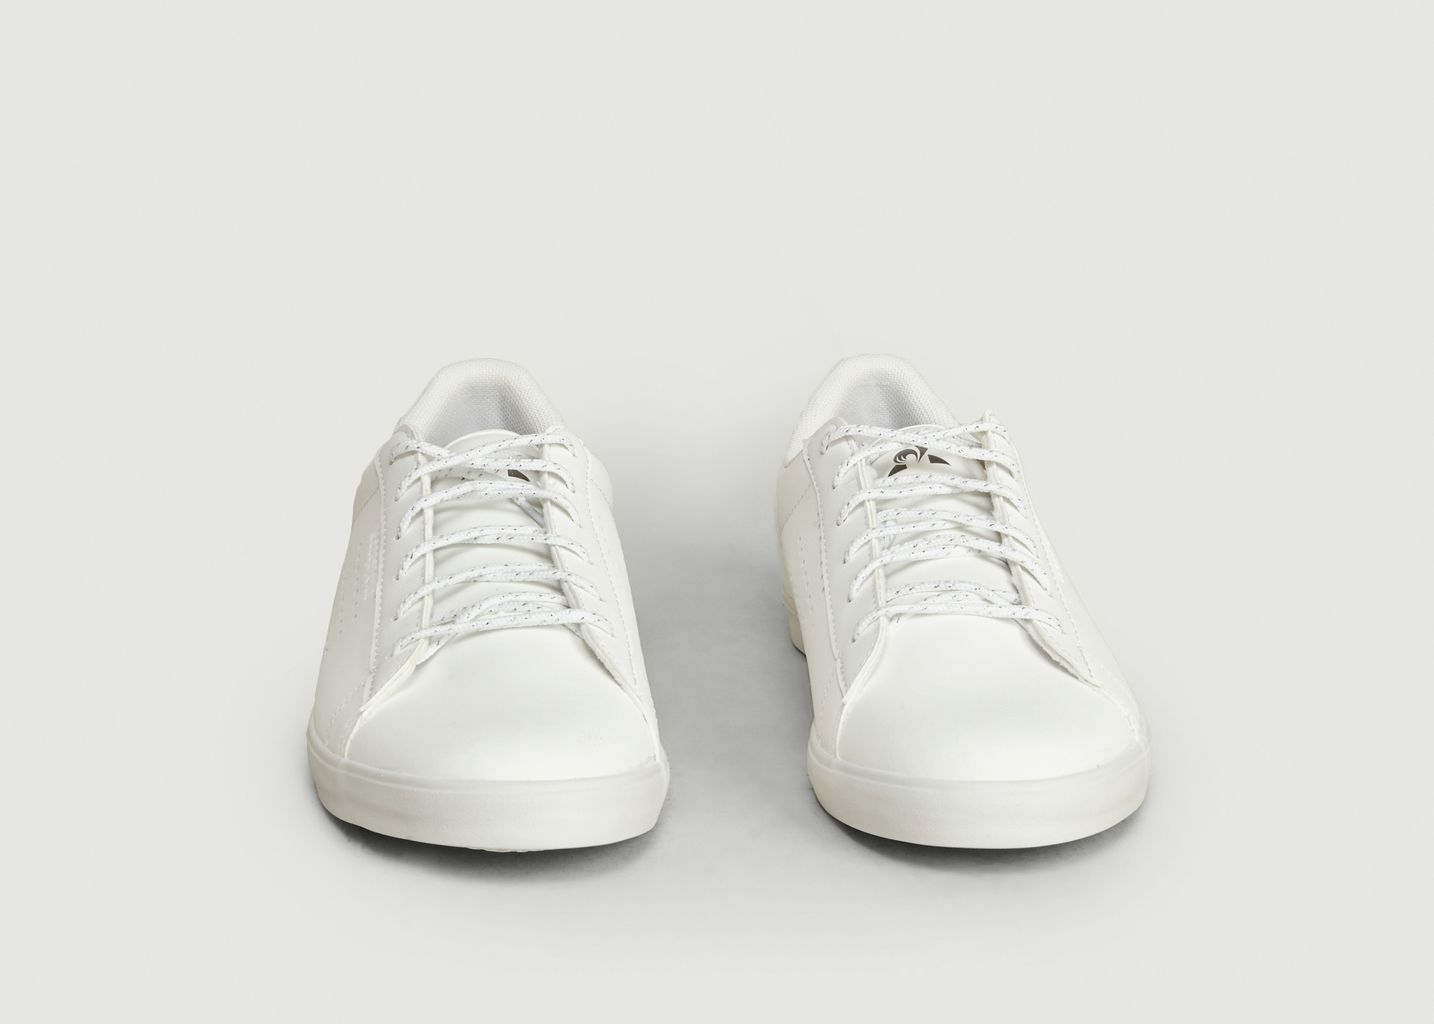 Sneakers Agate Premium - Le Coq Sportif